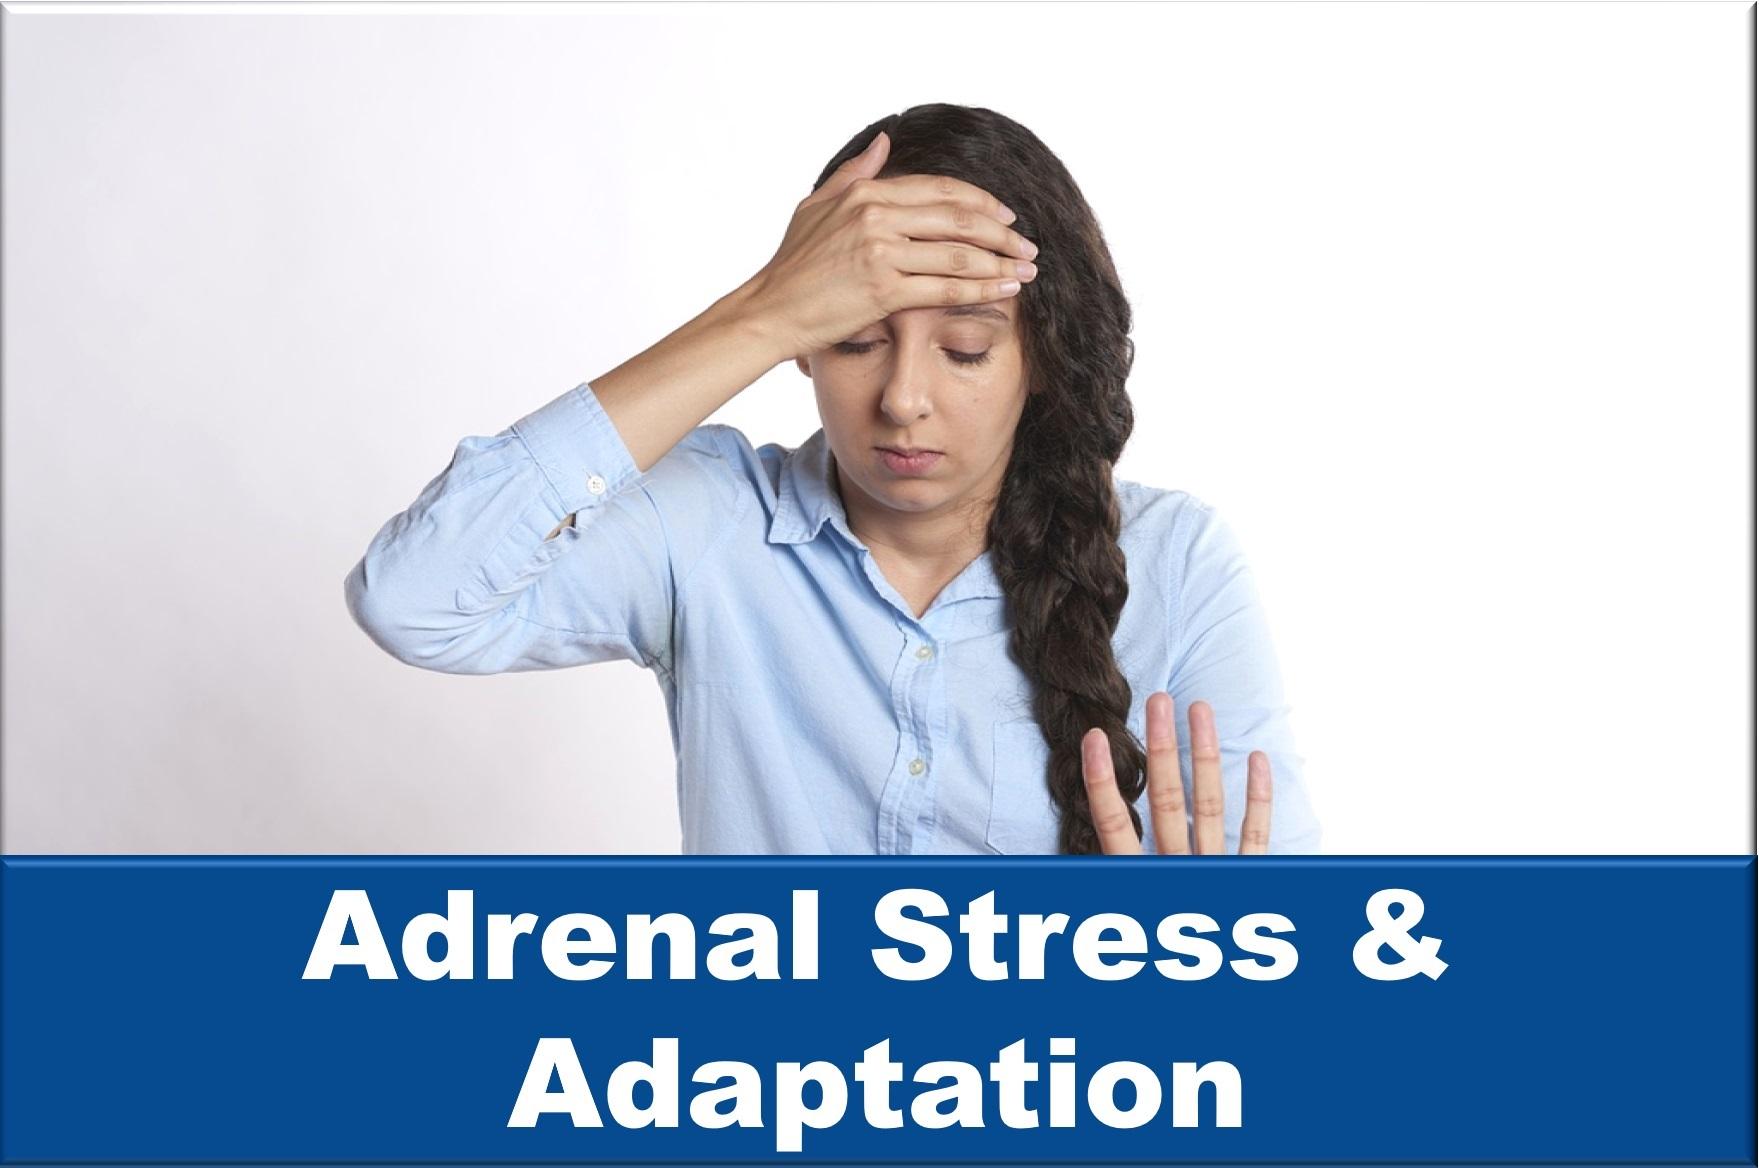 Adrenal Stress and Adaptation